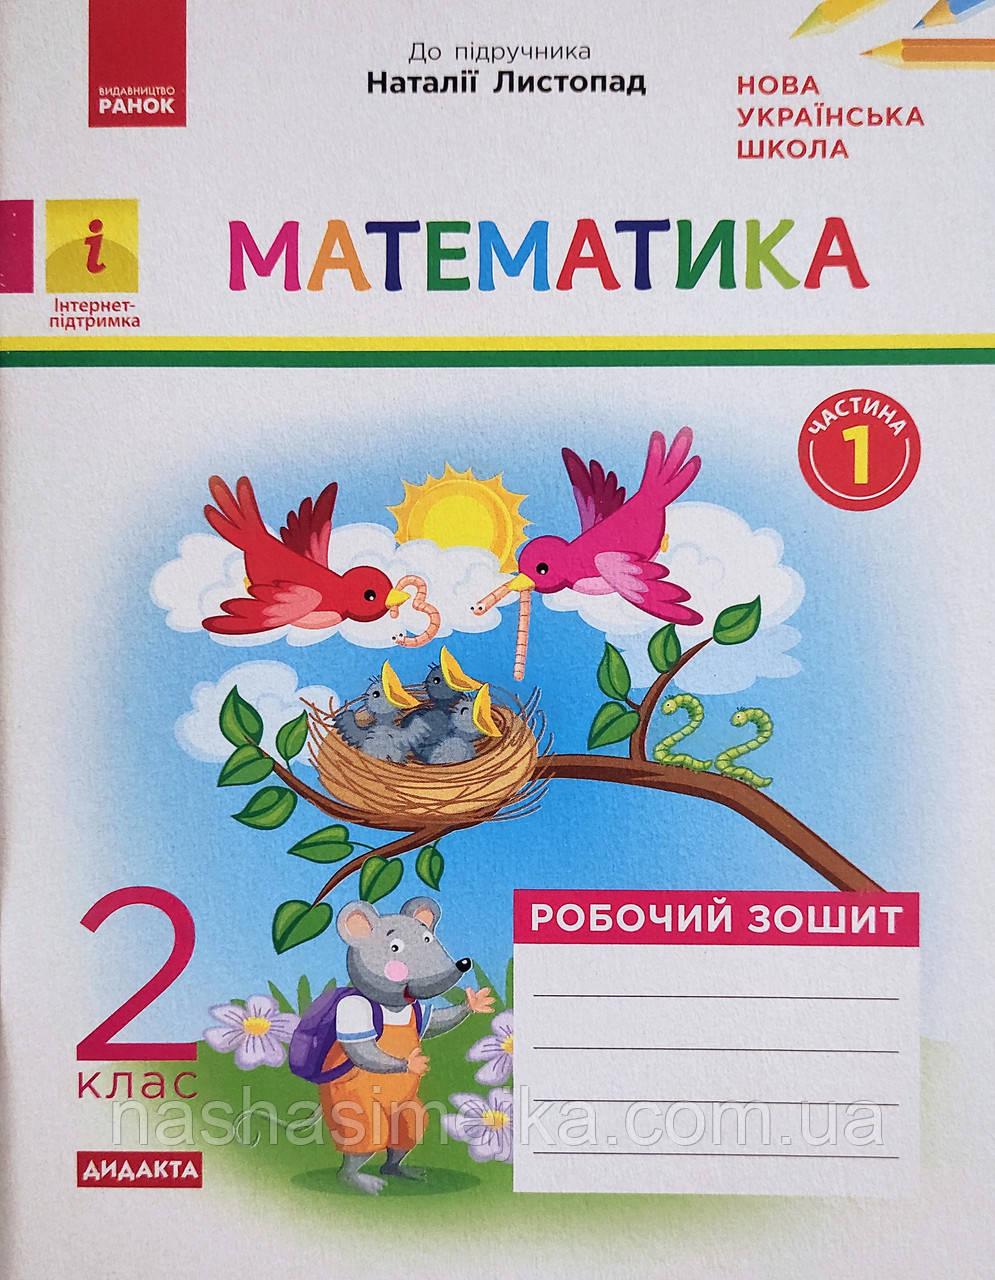 НУШ ДИДАКТА Математика. 2 клас. Робочий зошит до підручника Н. Листопад. У 2 частинах. Частина 1 (Ранок)